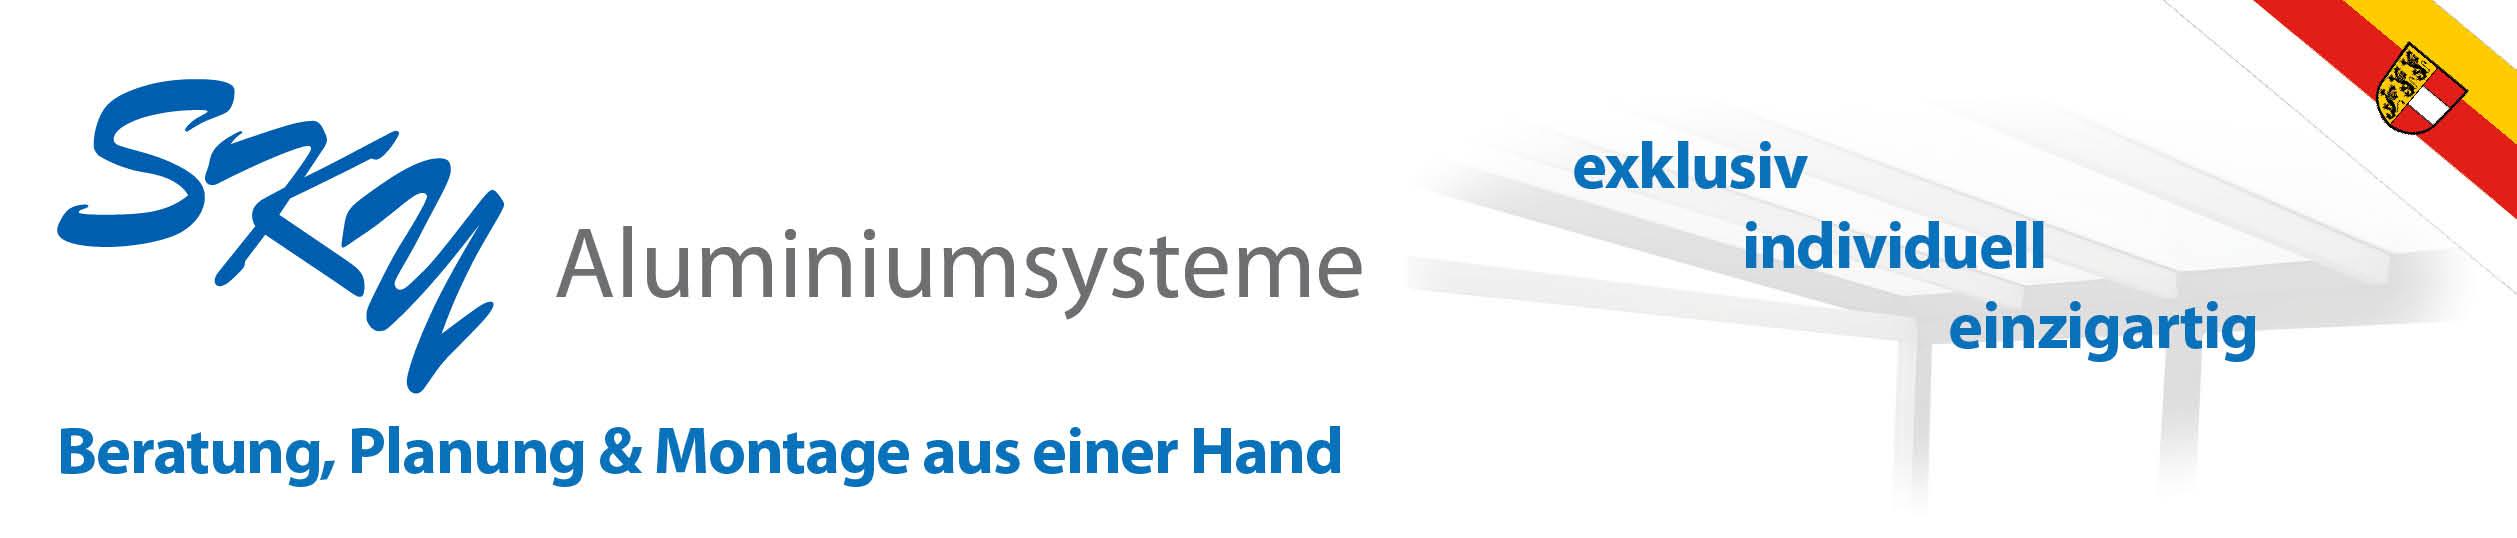 SKY Aluminiumsysteme - Terrassendächer, Schiebedächer, Carports uvm. Logo